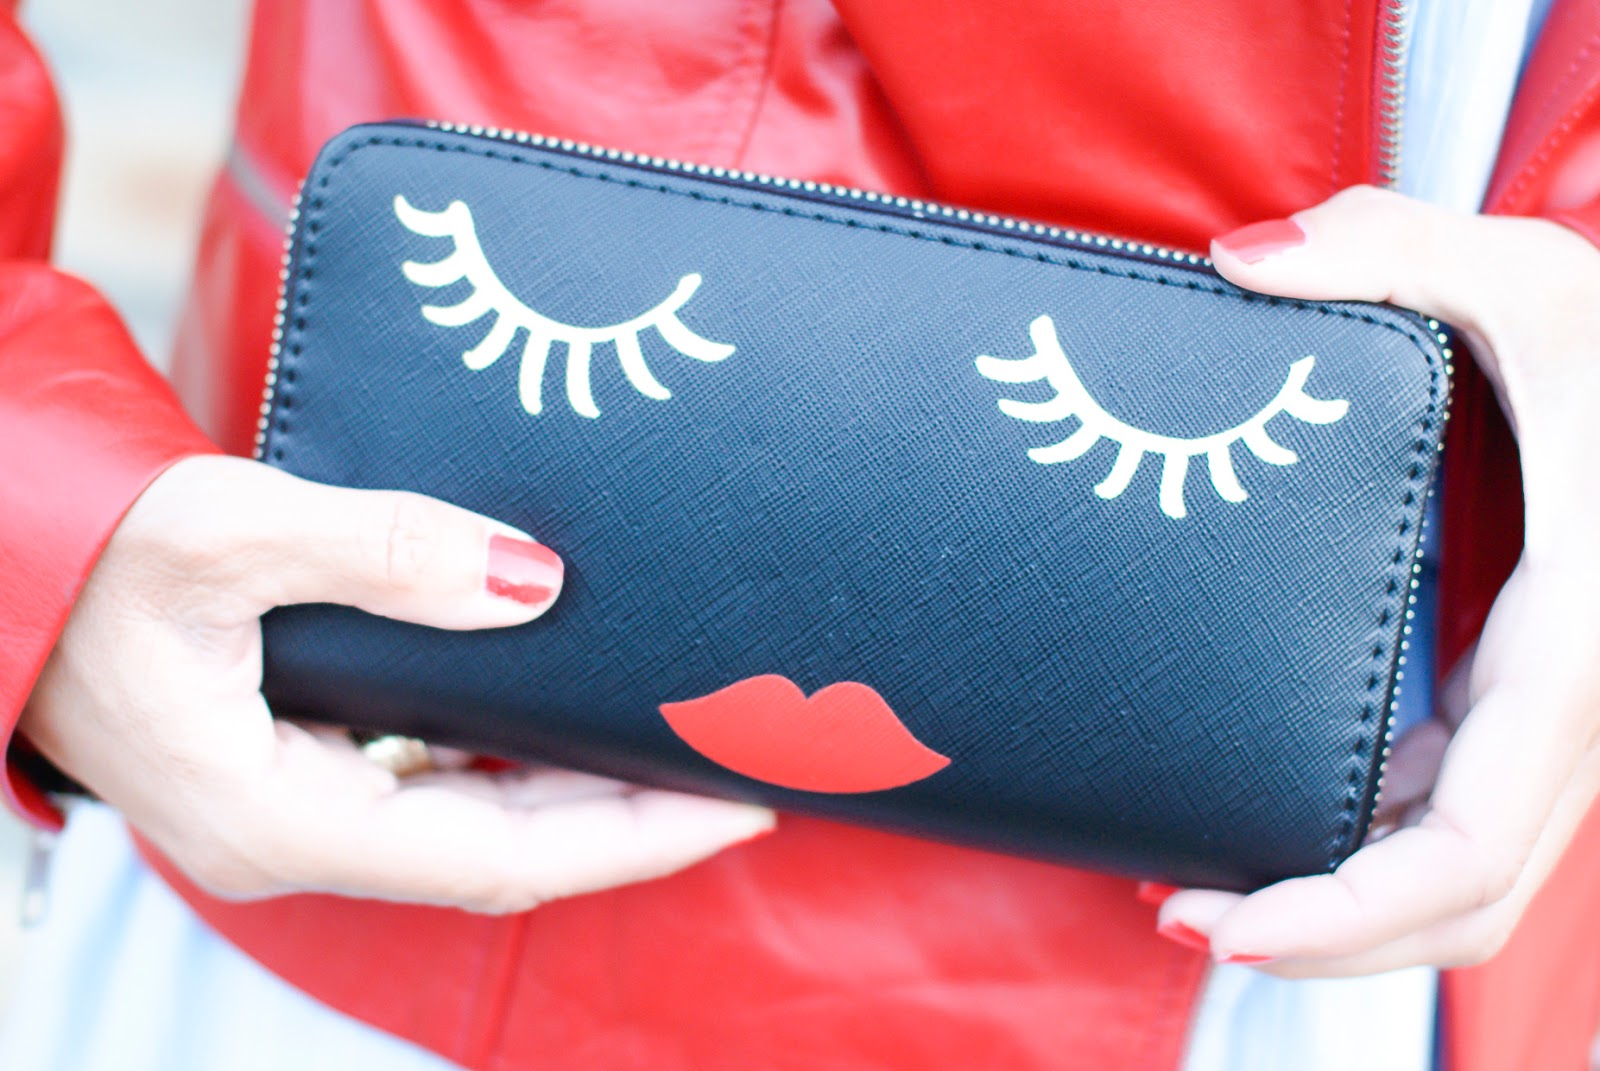 Stradivarius face purse on Fashion and Cookies fashion blog, fashion blogger style